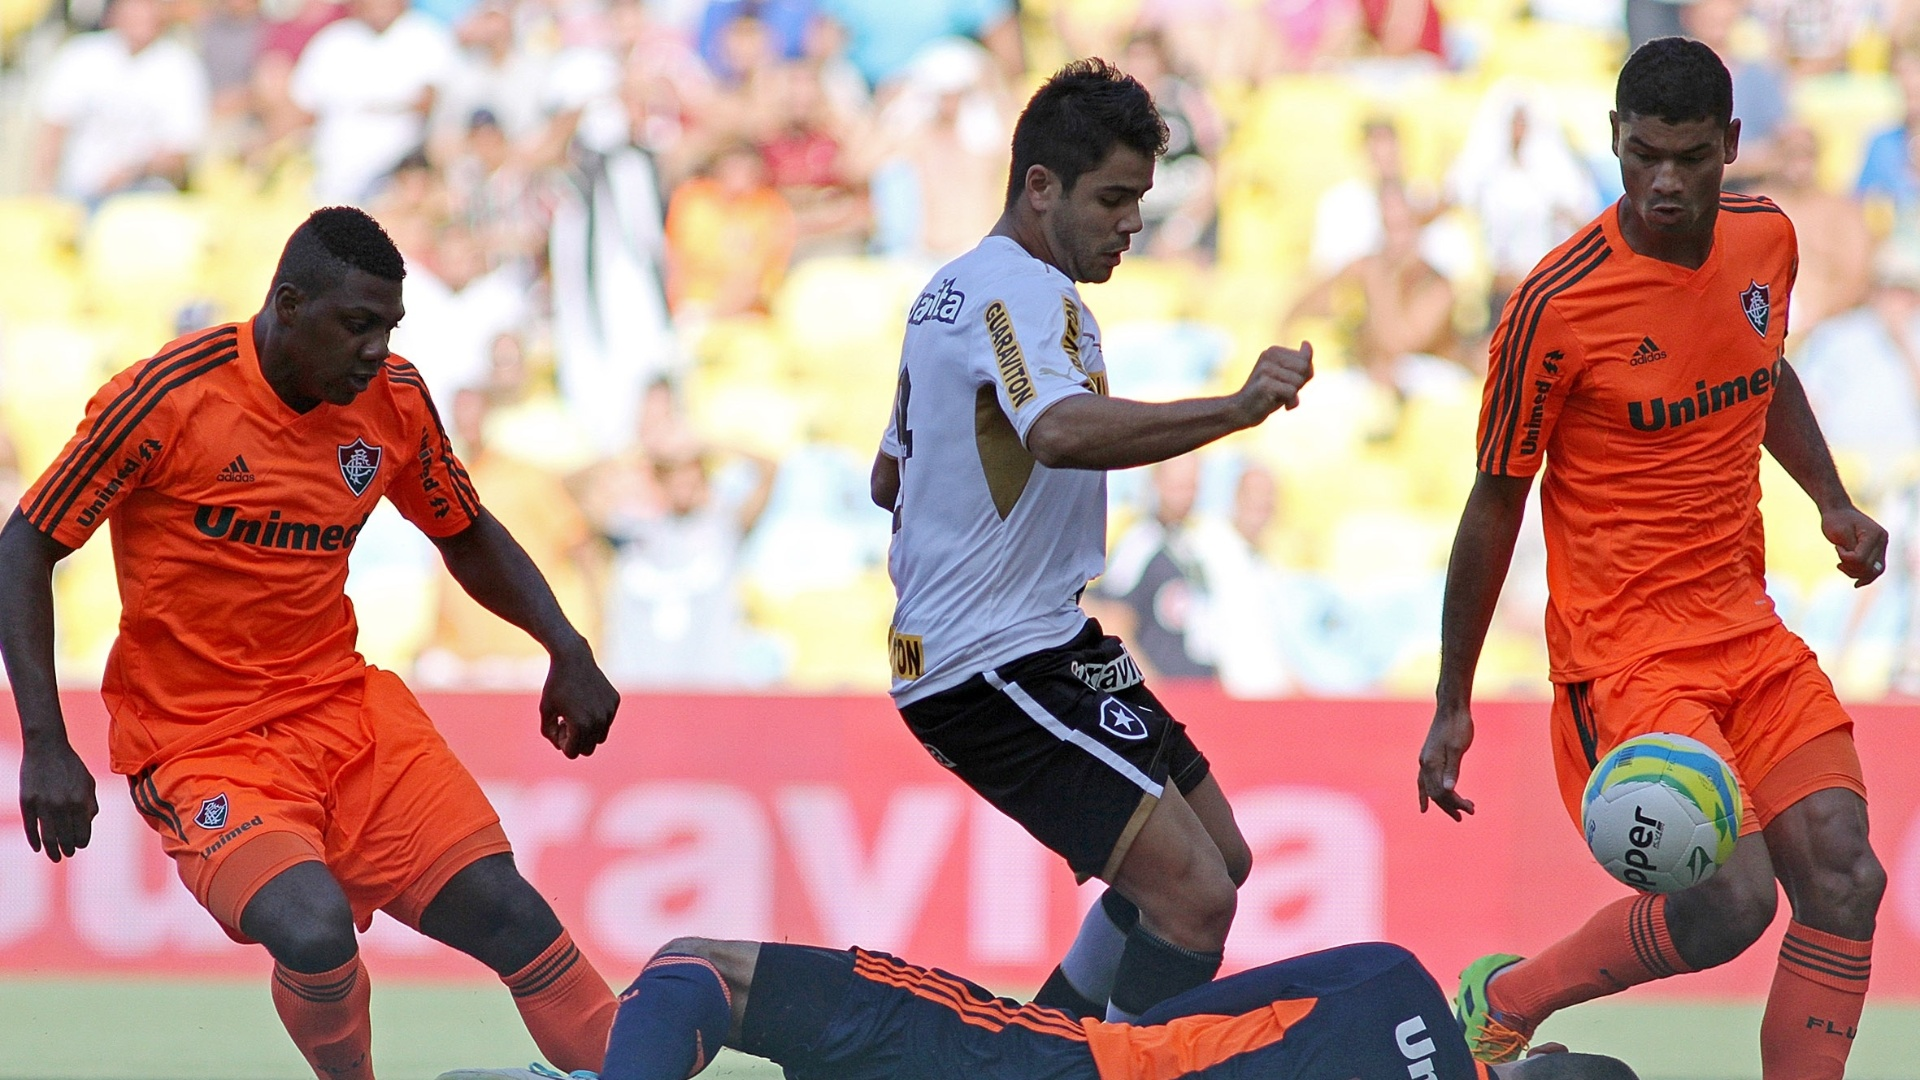 23.fev.2014 - Atacante Henrique tenta abrir o placar para o Botafogo, mas Diego Cavalieri defende para o Fluminense